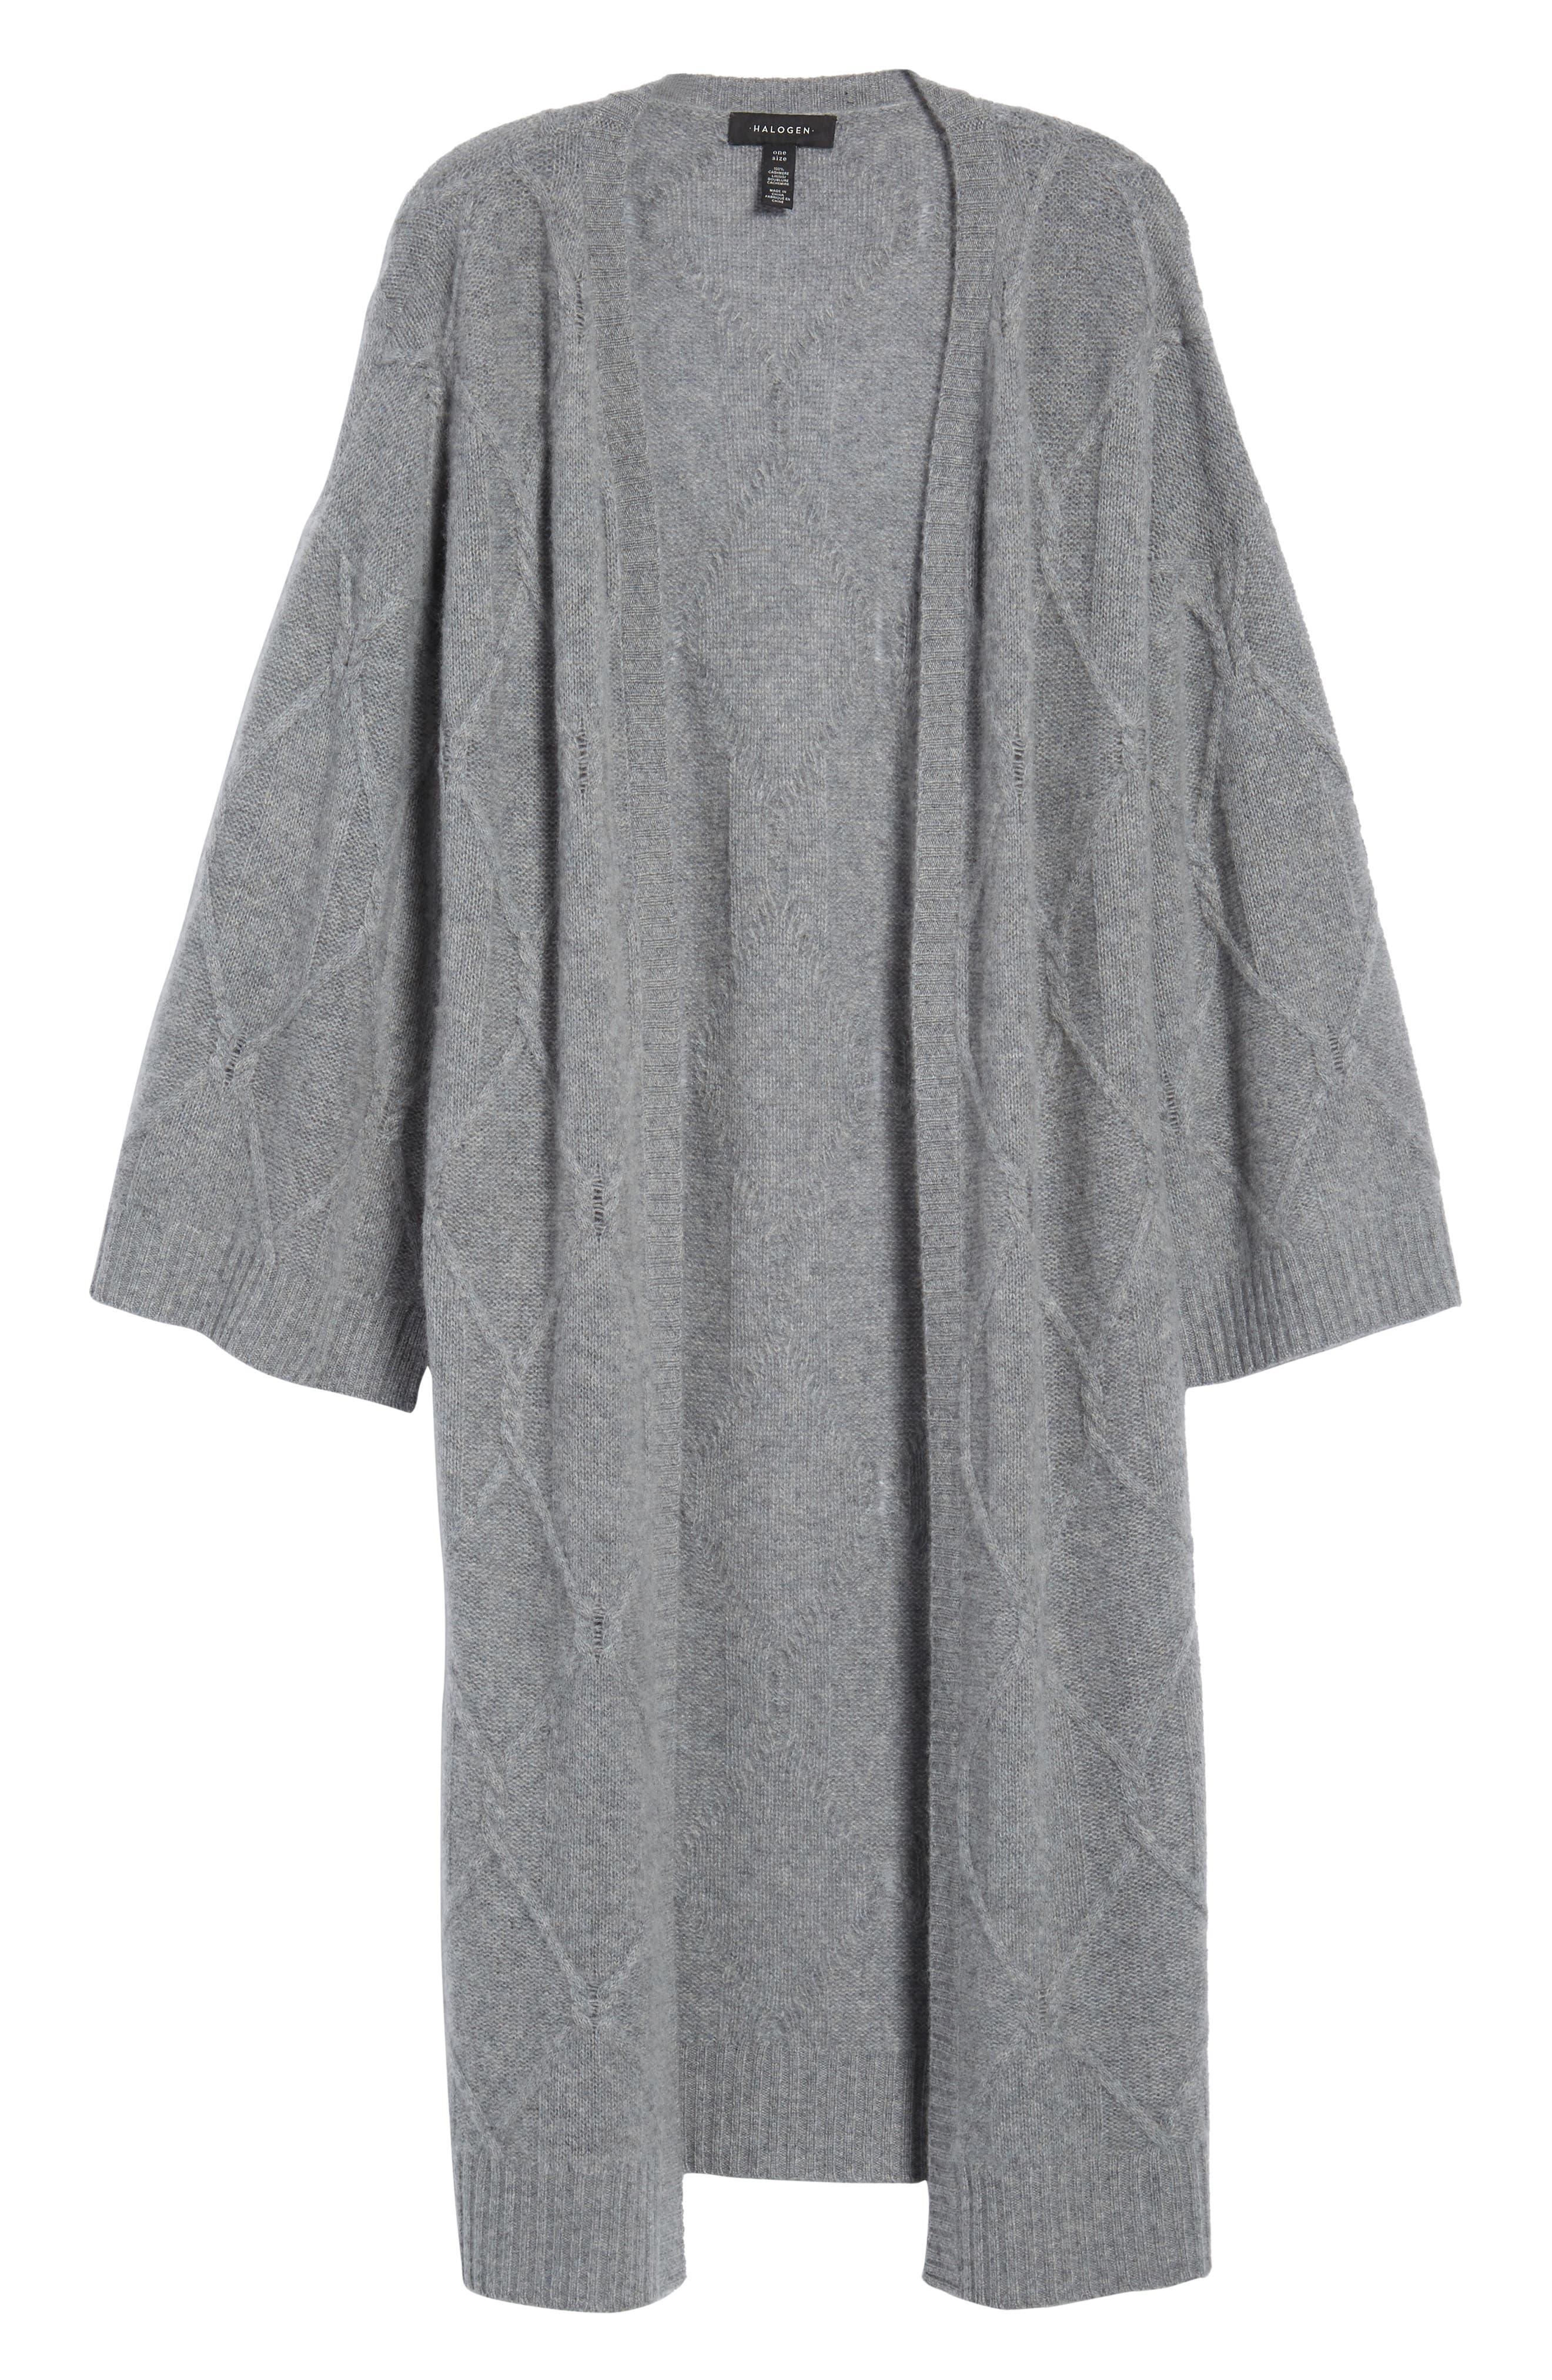 Cable Knit Long Cashmere Cardigan,                             Alternate thumbnail 6, color,                             GREY MEDIUM HEATHER